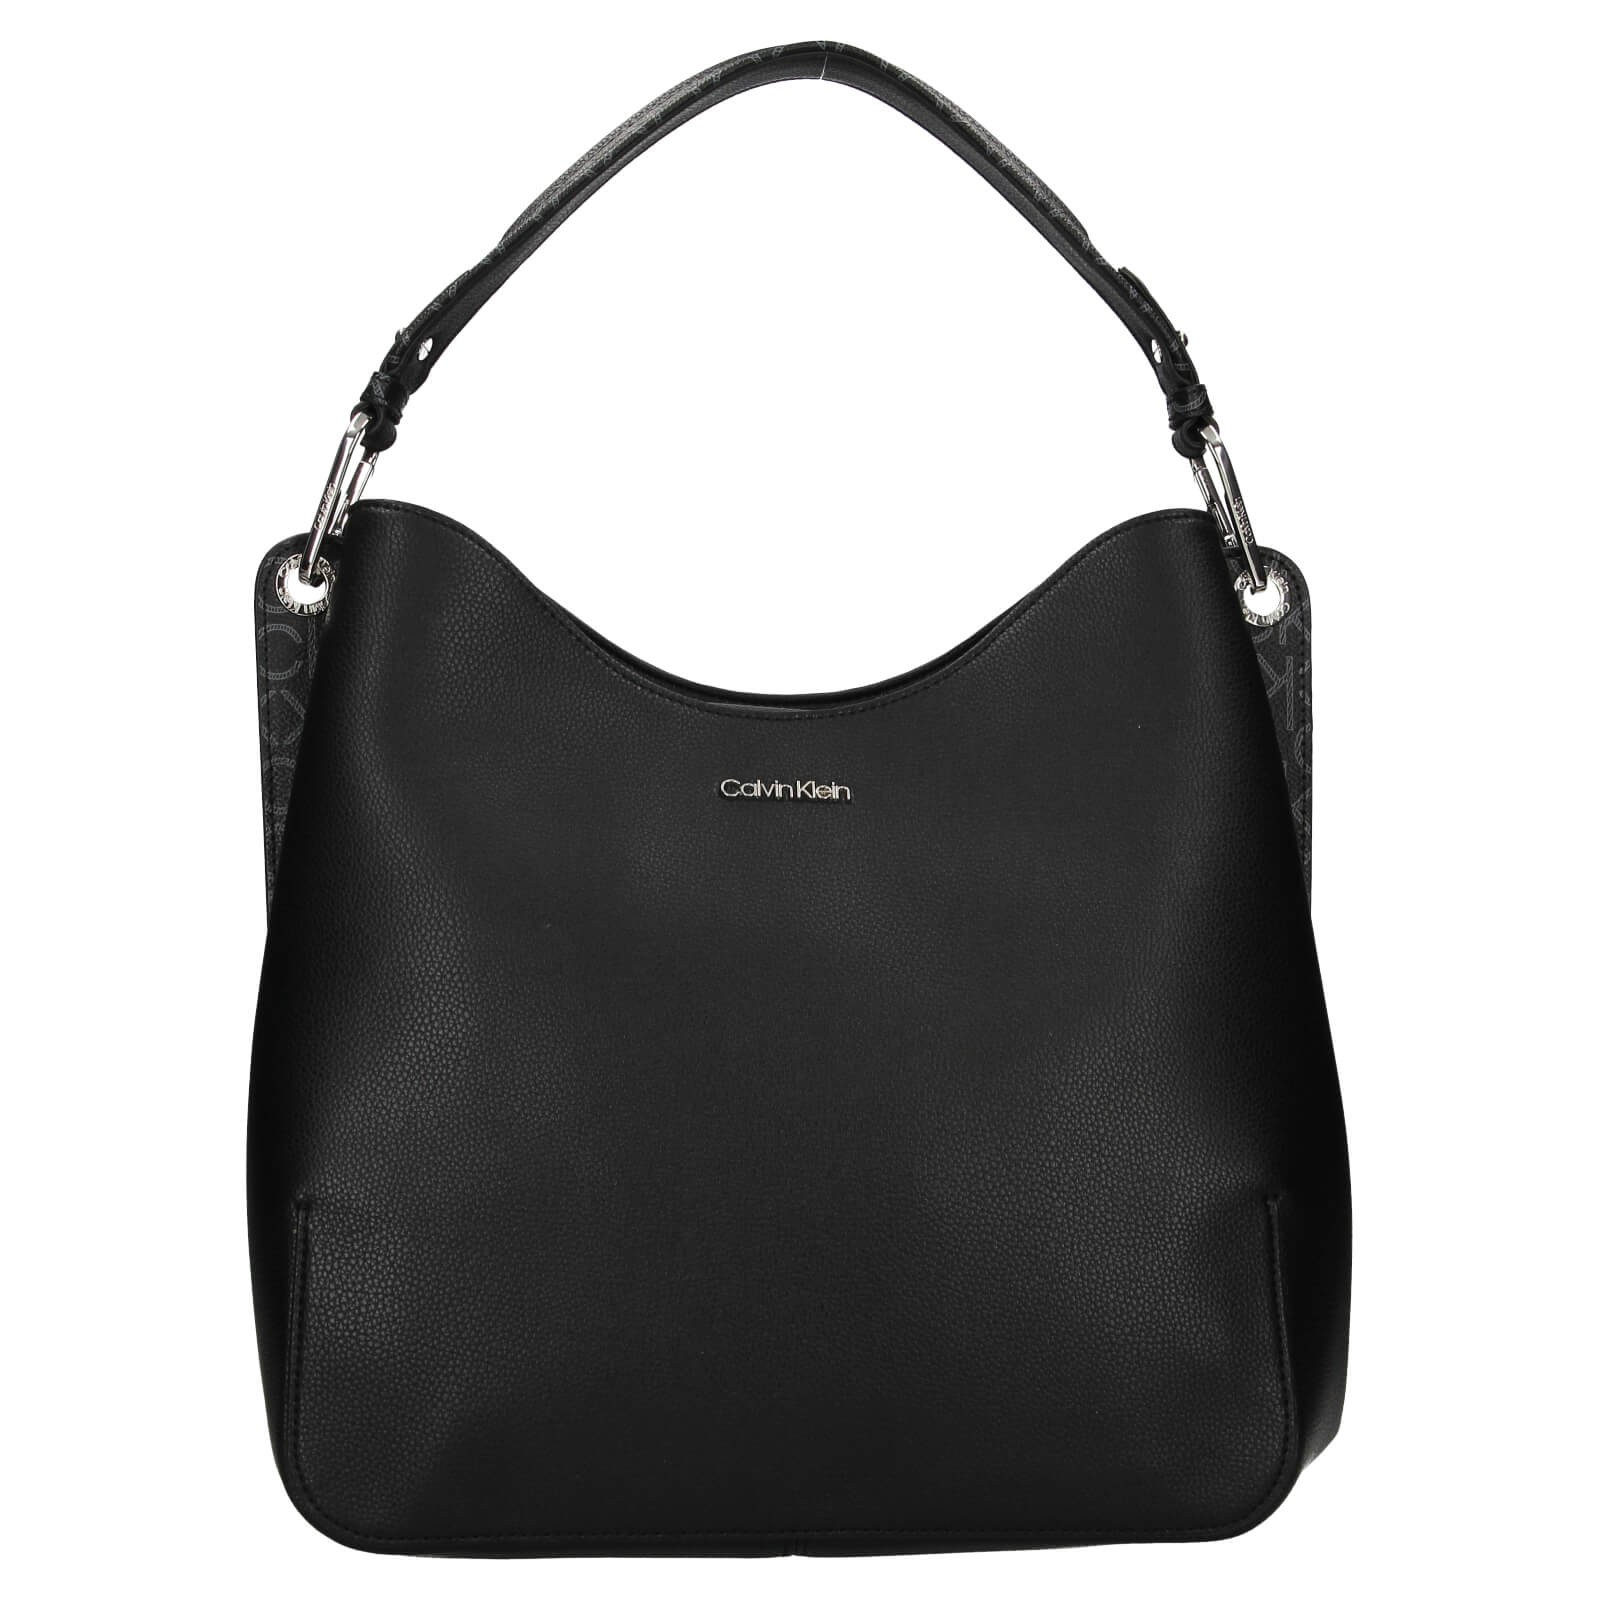 Dámska kabelka Calvin Klein Kenneta - čierna